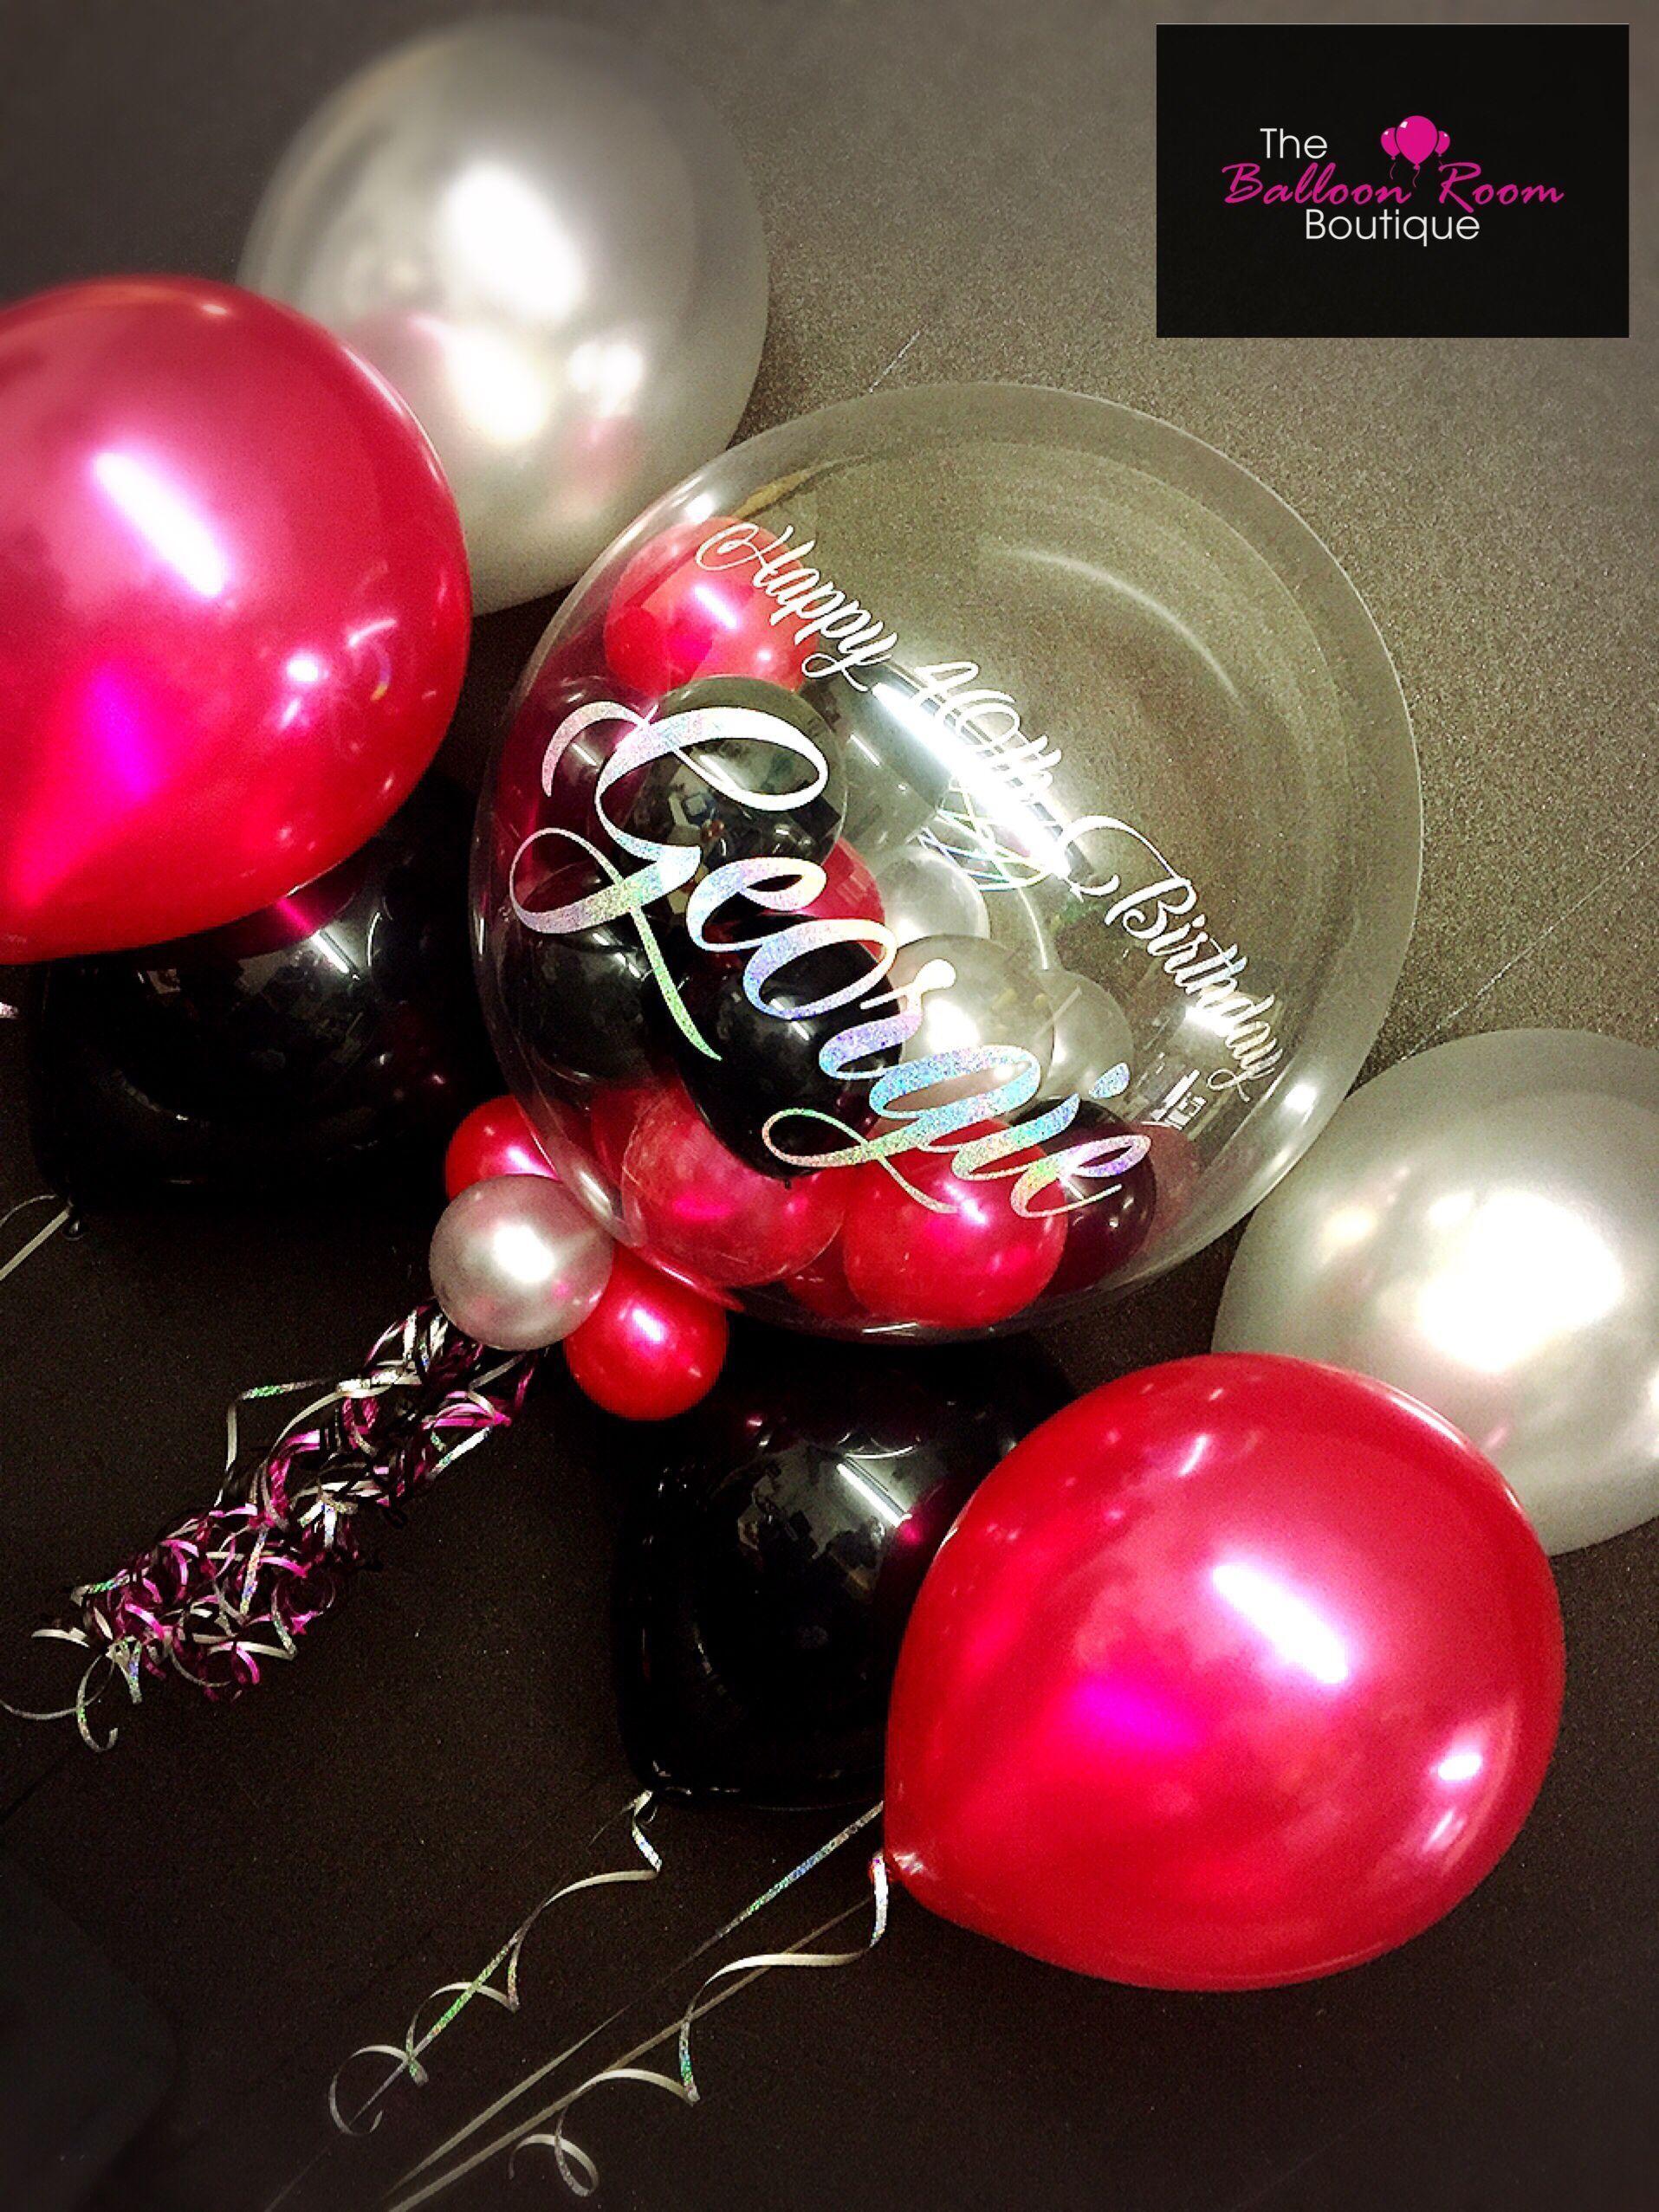 Personalised Balloons #personalisedballoons Personalised balloon and balloon bouquets #personalisedballoons Personalised Balloons #personalisedballoons Personalised balloon and balloon bouquets #personalisedballoons Personalised Balloons #personalisedballoons Personalised balloon and balloon bouquets #personalisedballoons Personalised Balloons #personalisedballoons Personalised balloon and balloon bouquets #personalisedballoons